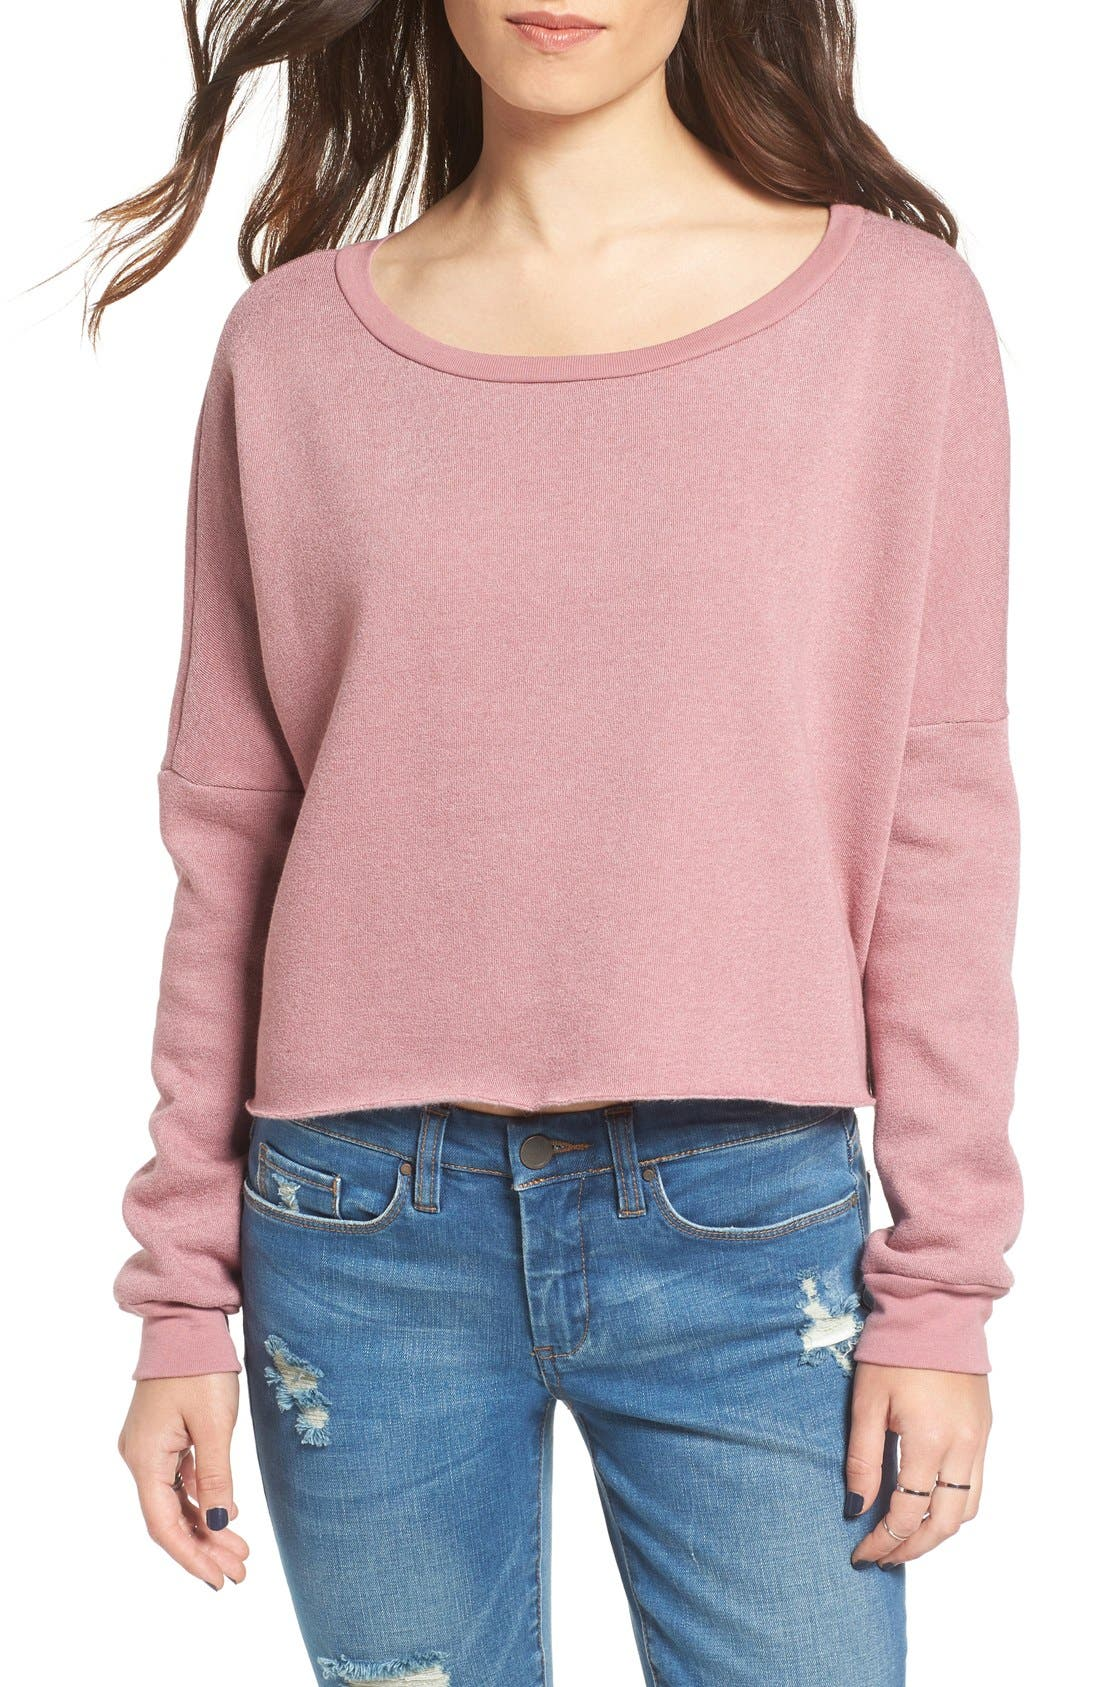 Alternate Image 1 Selected - Project Social T Raw Edge Crop Sweatshirt